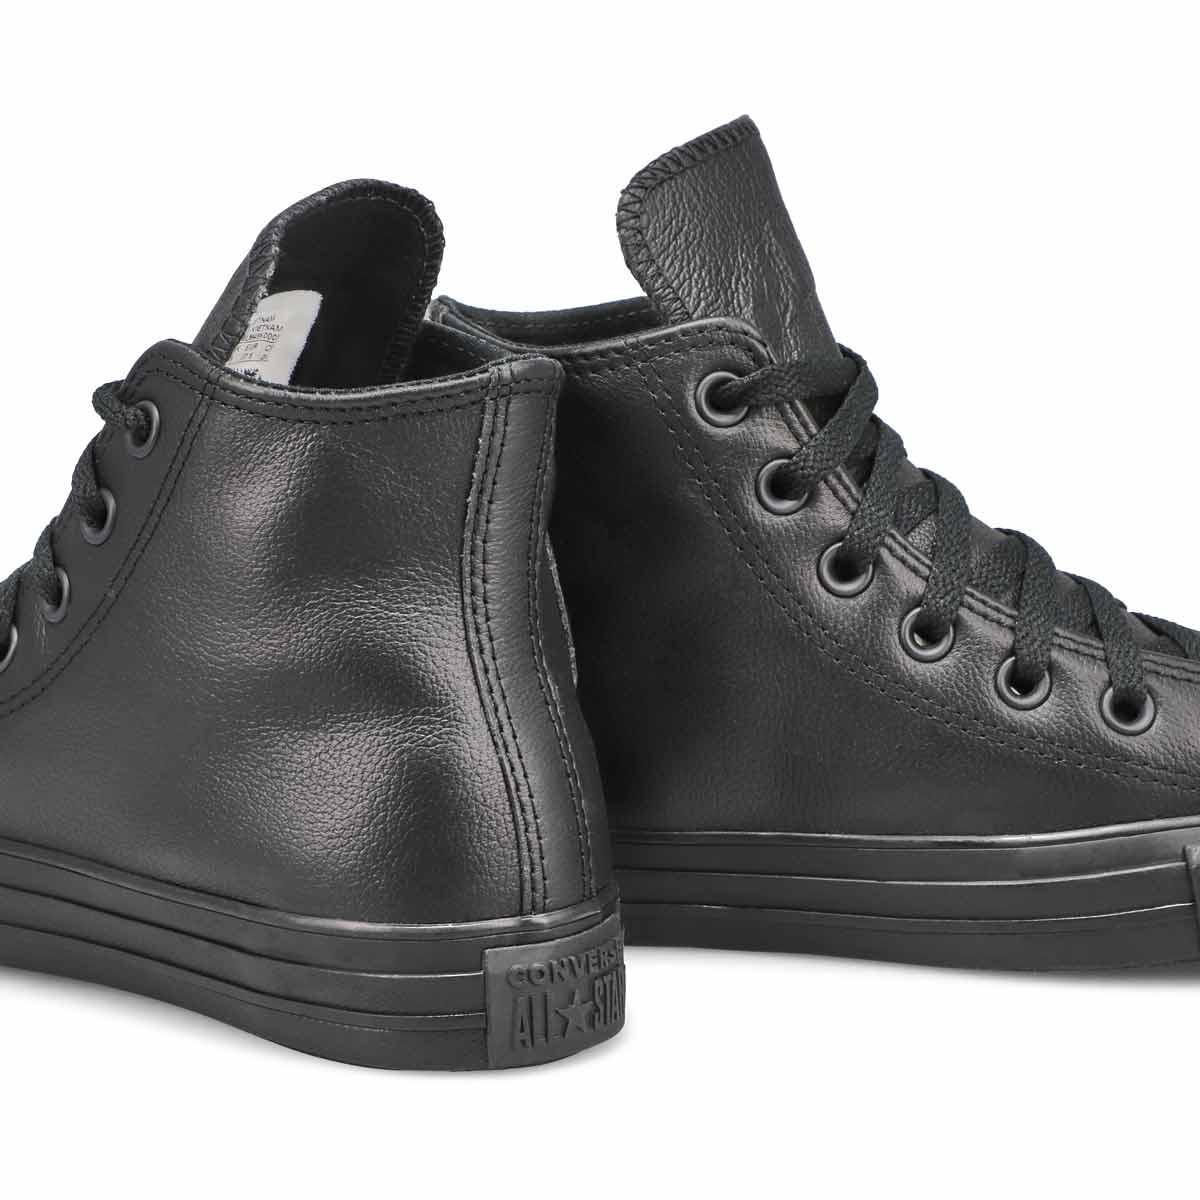 Women's All Star Leather Hi Top Sneaker - Black